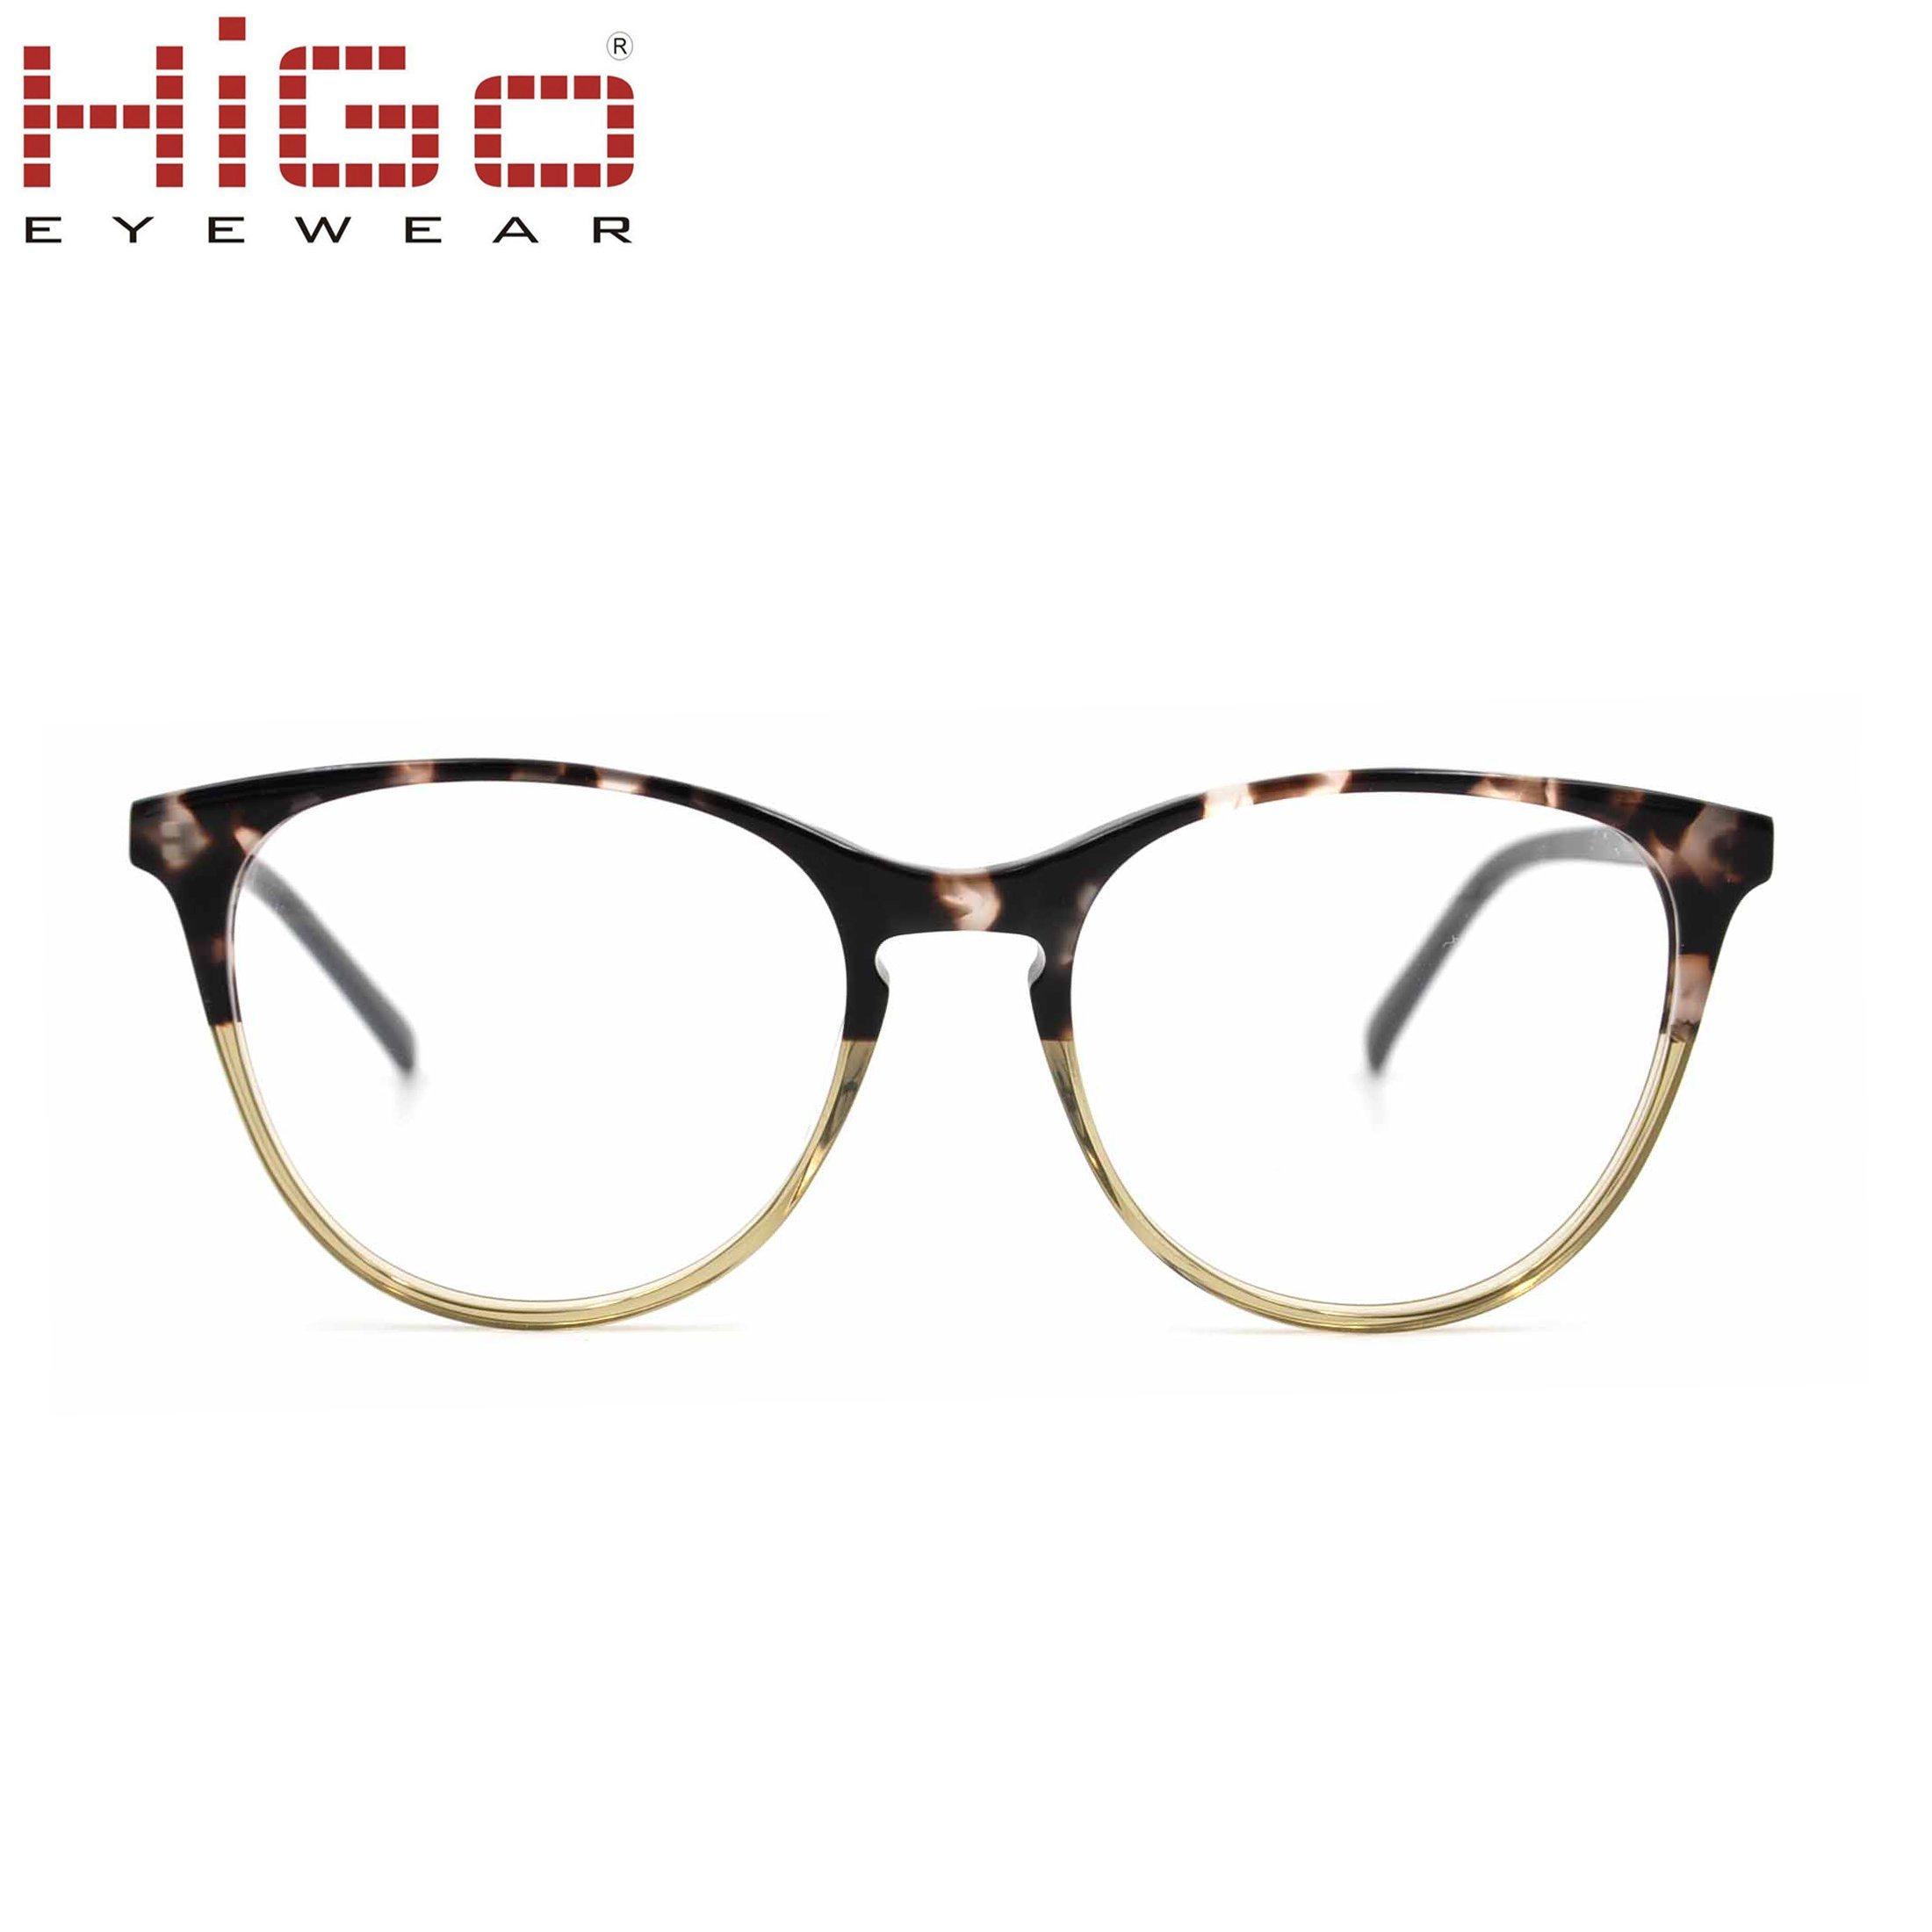 China New Model Circle Lens Glasses, Wholesale Acetate Frames ...